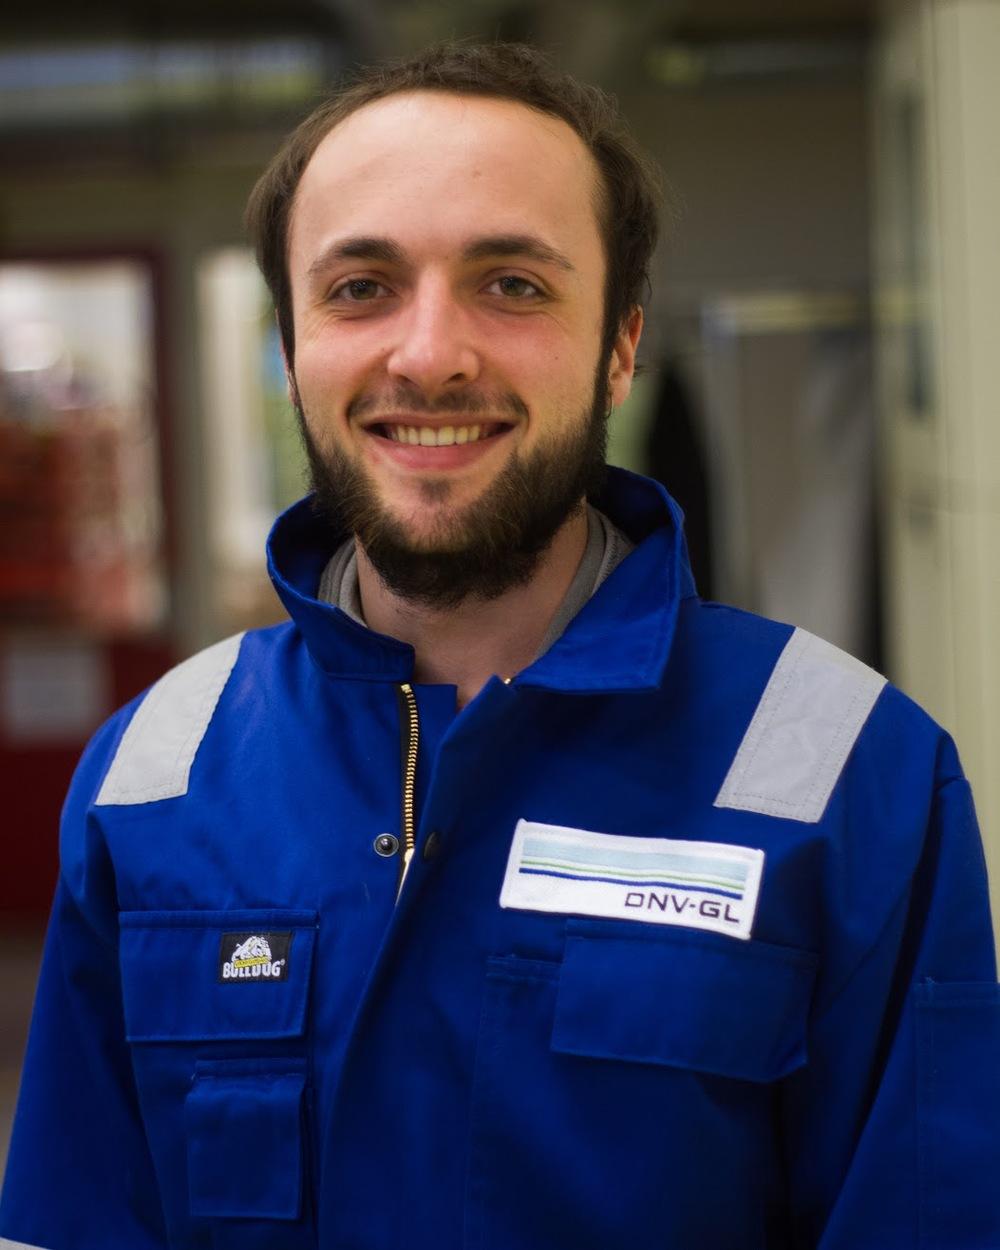 Sacha Danjou– Motor Controller Studies:Power Engineering Campus: NTNU Gløshaugen Hometown: Rouen, France